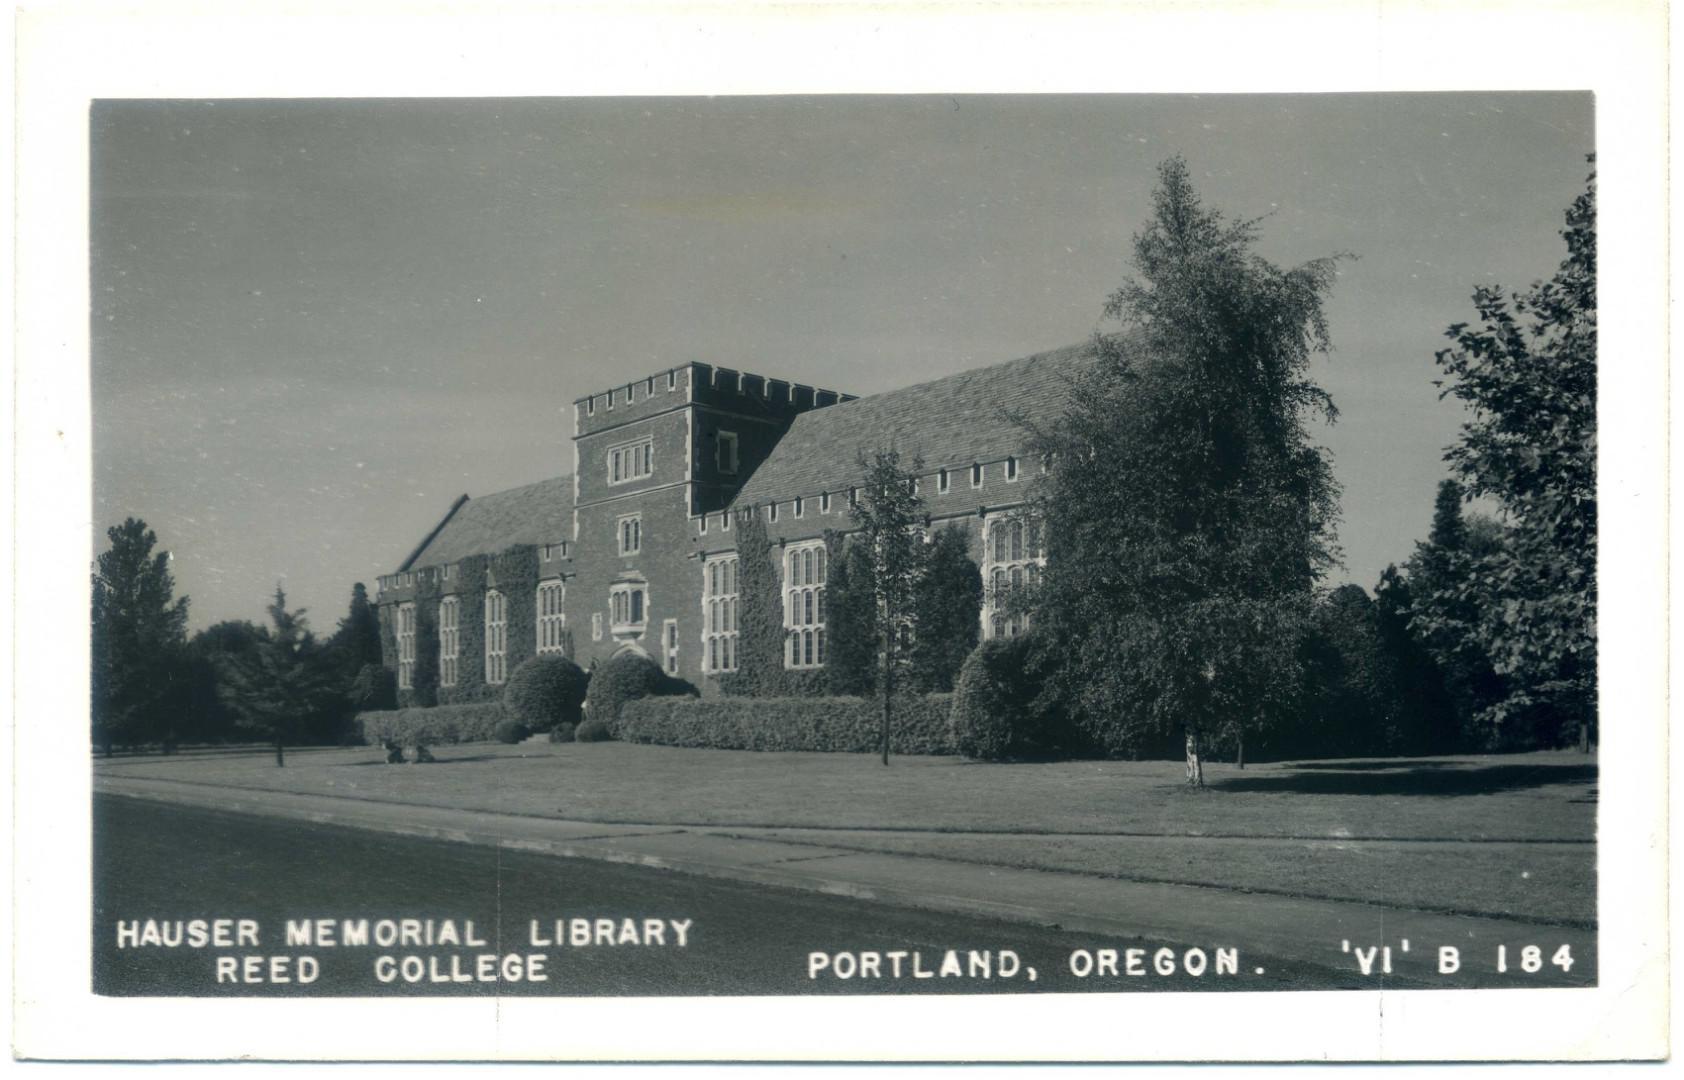 Portland (Oregon): Reed College, Hauser Memorial Library